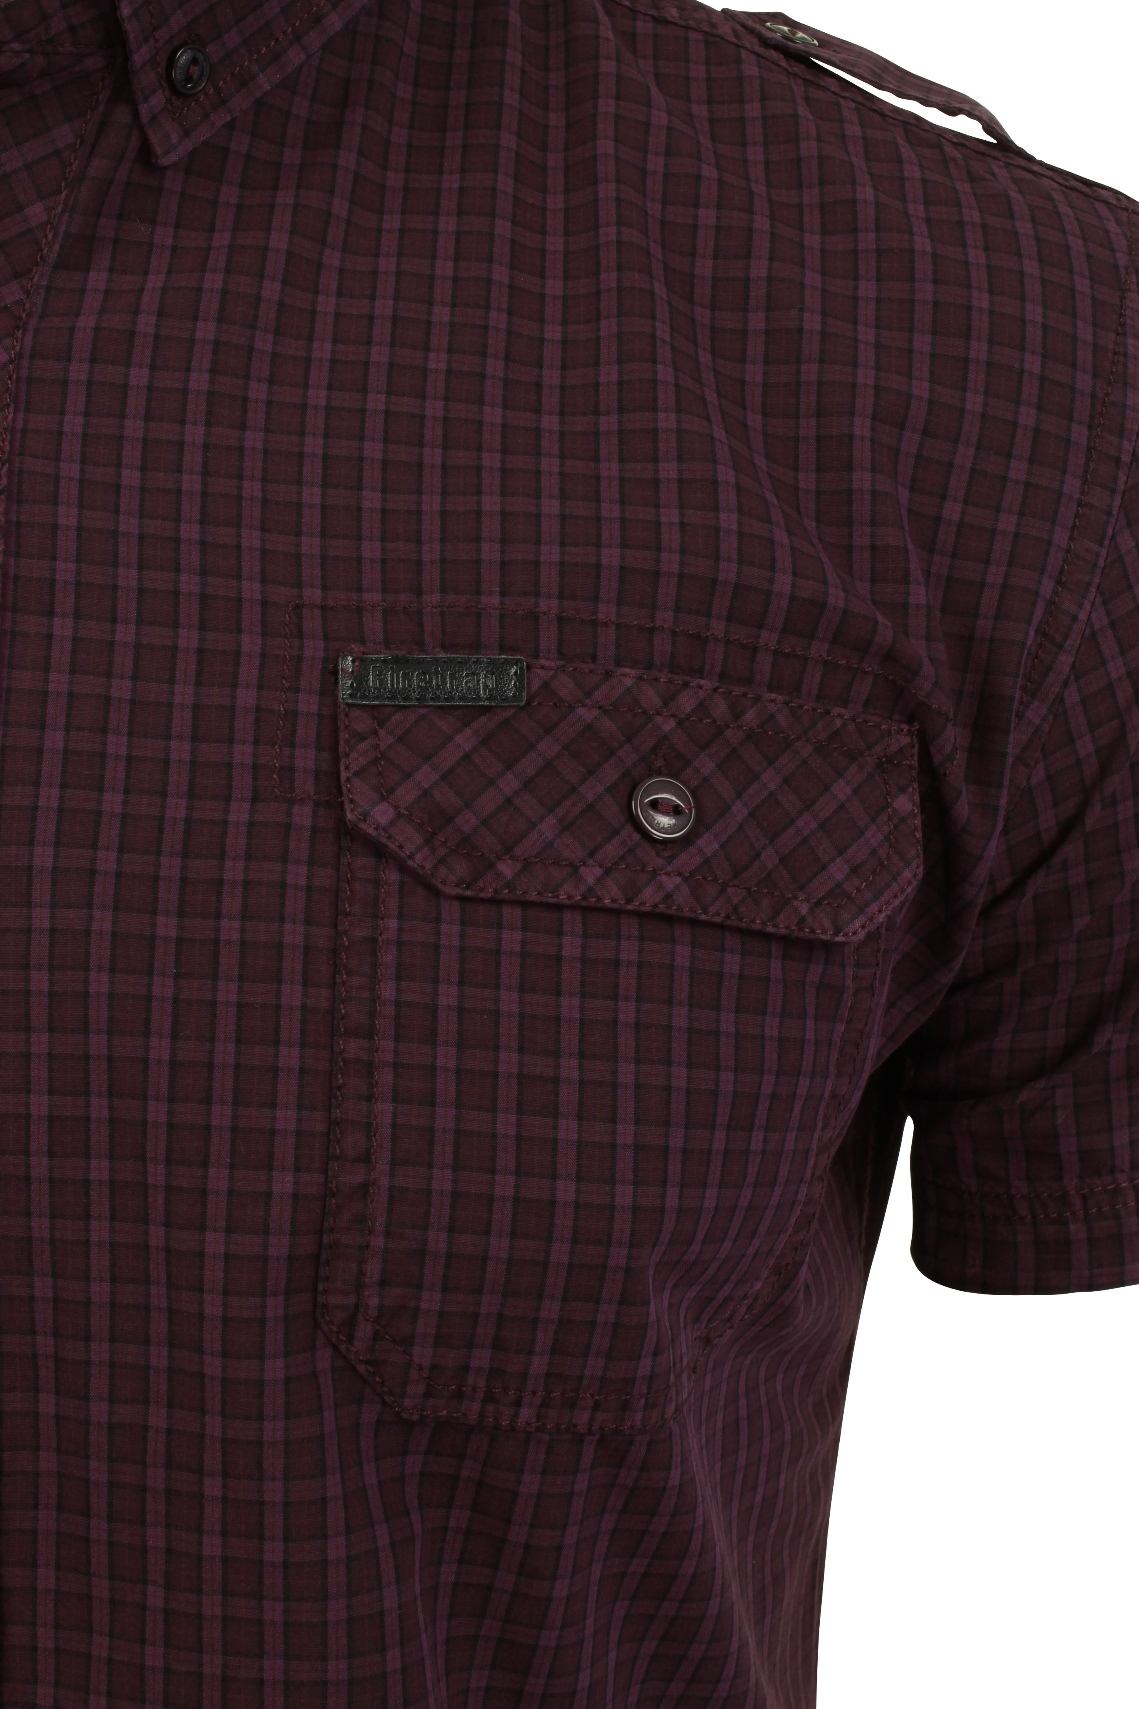 Mens-Short-Sleeved-Shirt-by-Firetrap thumbnail 22